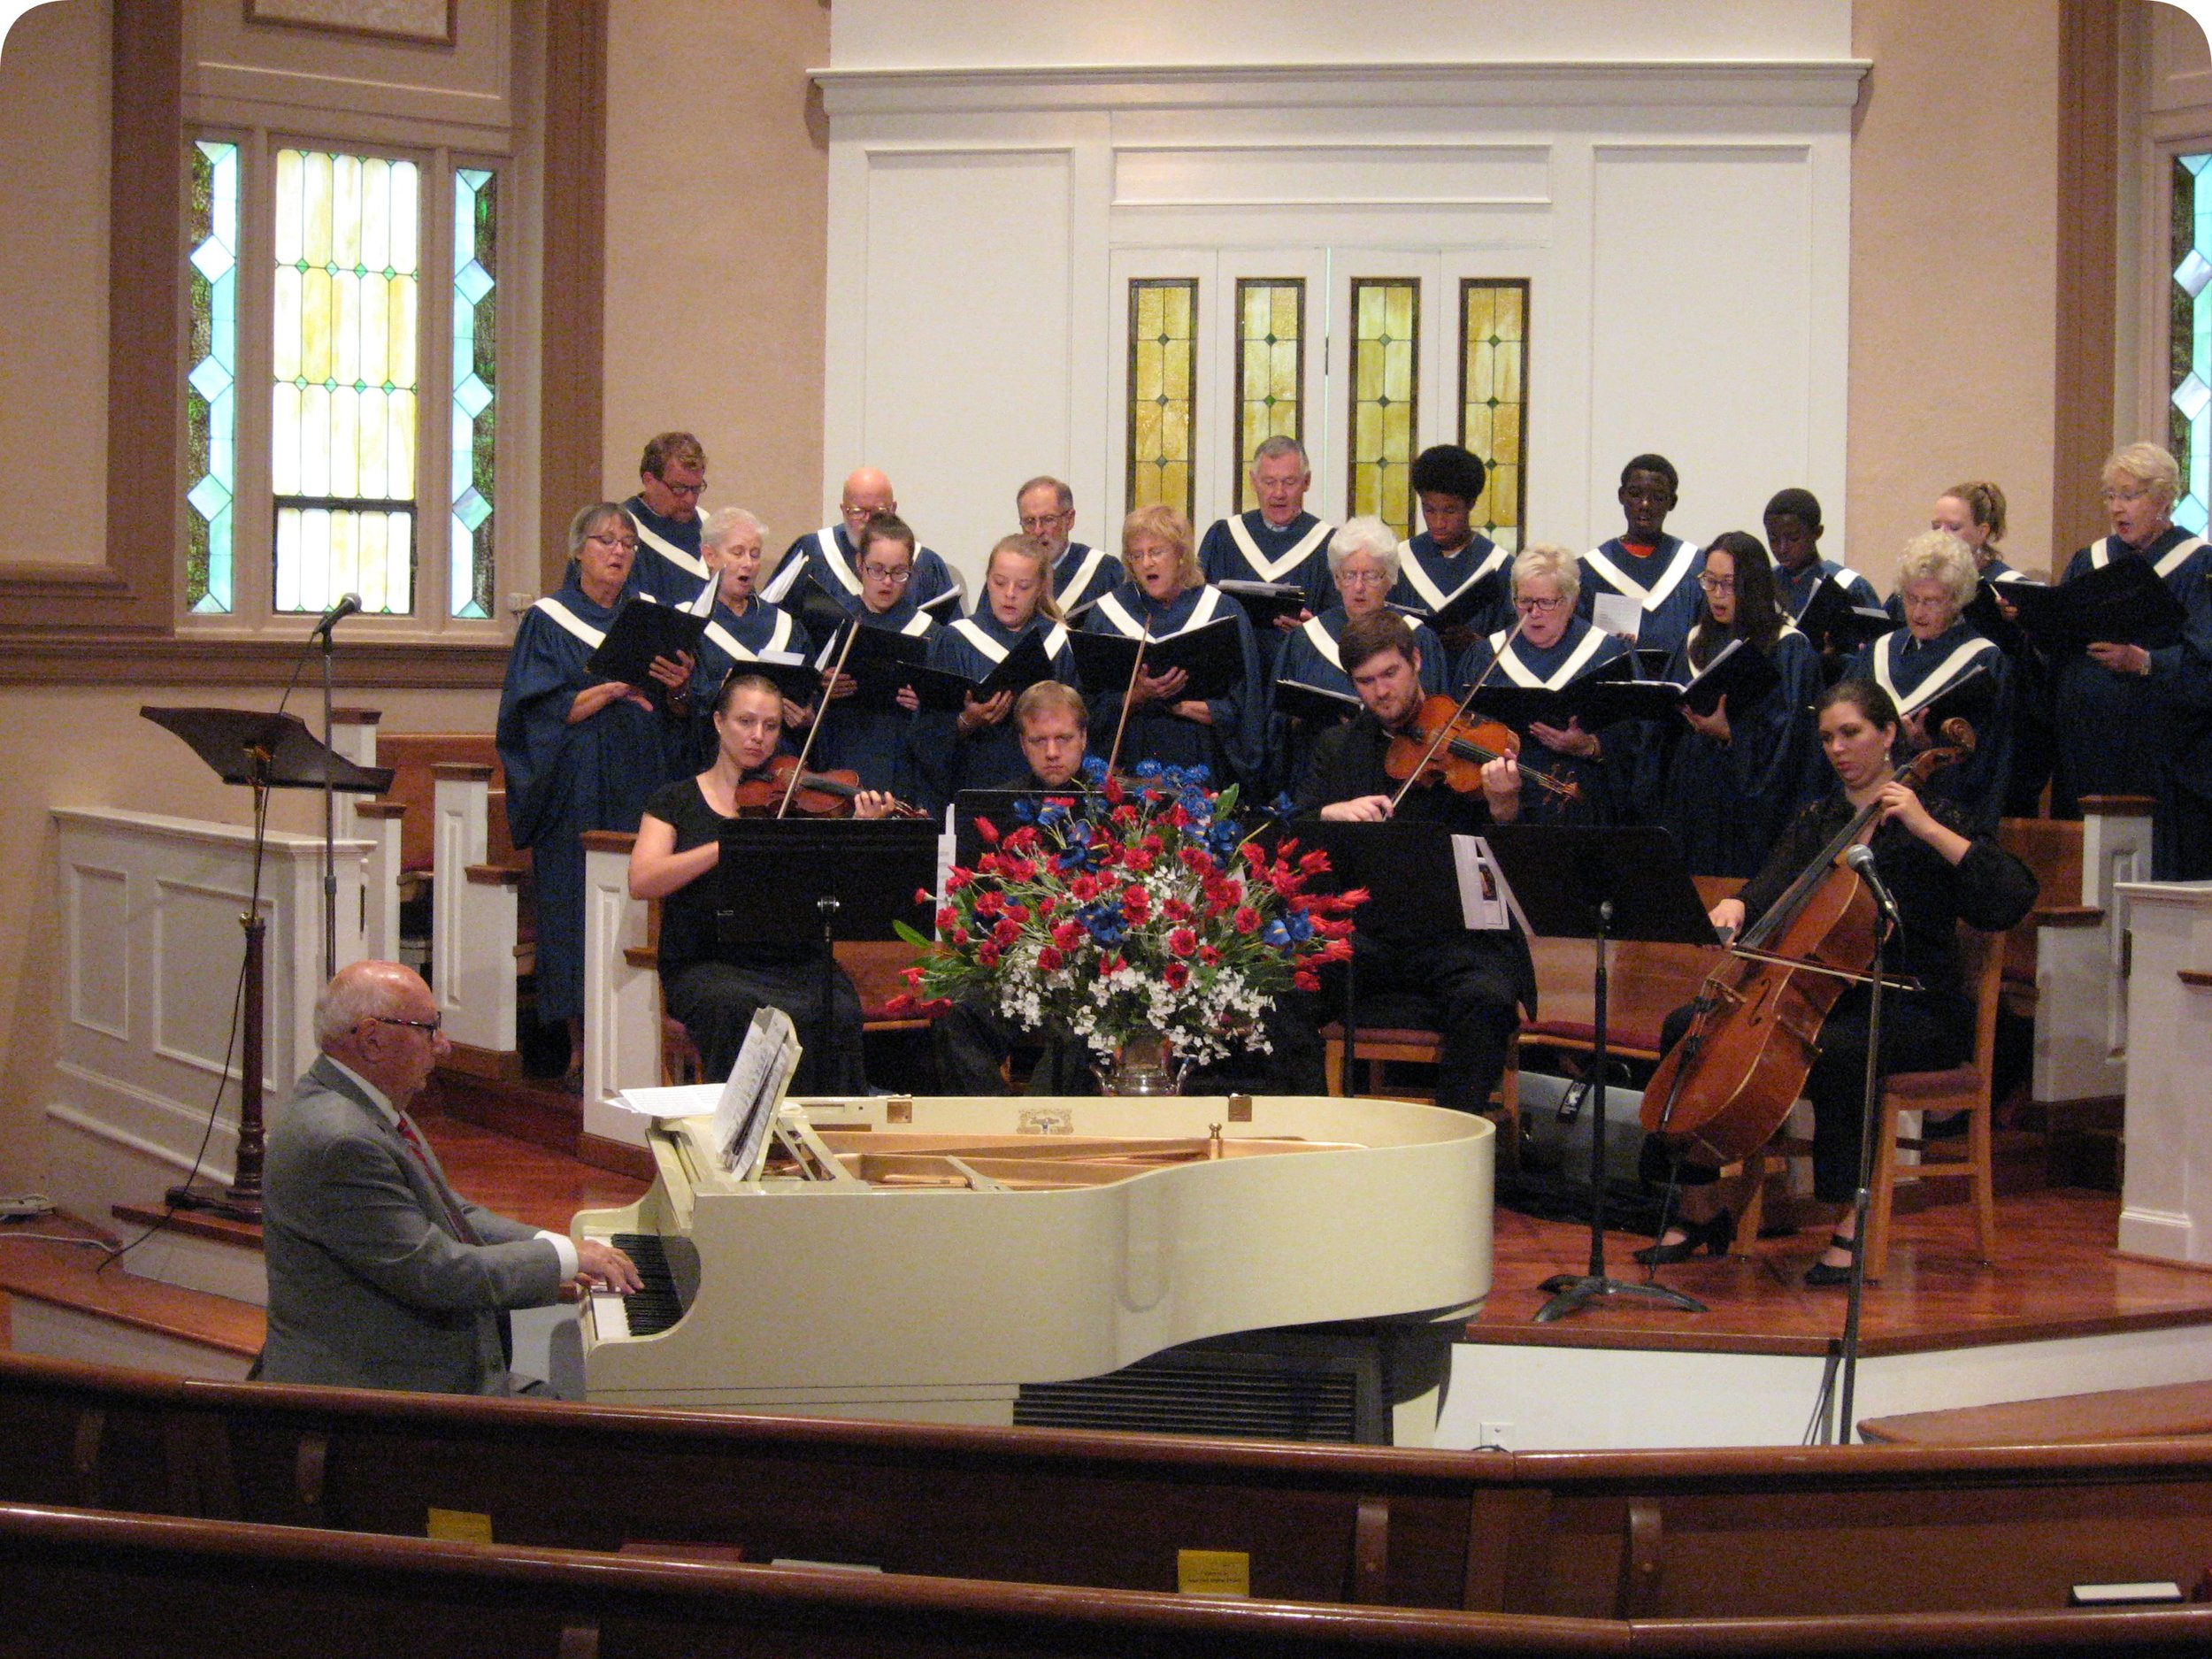 Round Choir & Musicians 2 070515.JPG